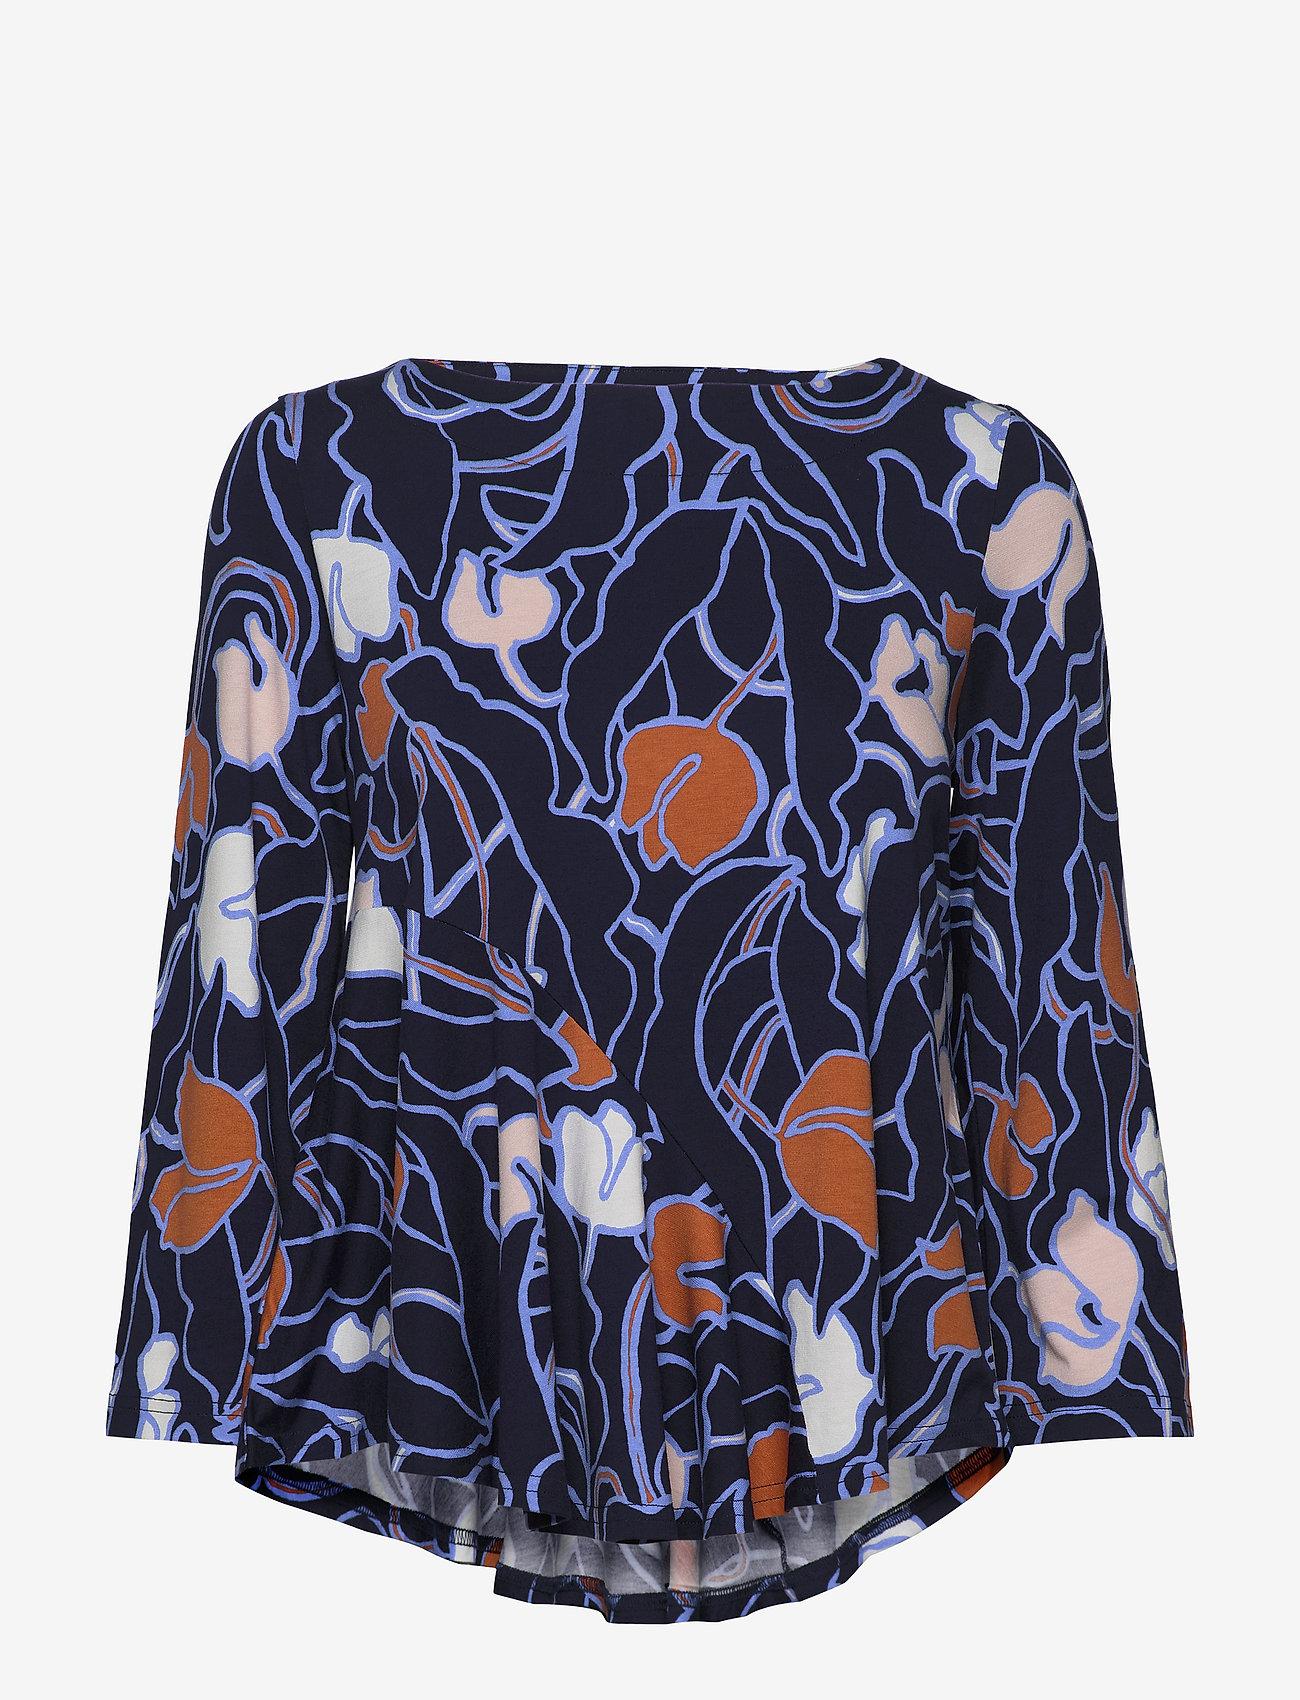 Nanso - Ladies blouse, Iiris - long sleeved blouses - dark blue - 0